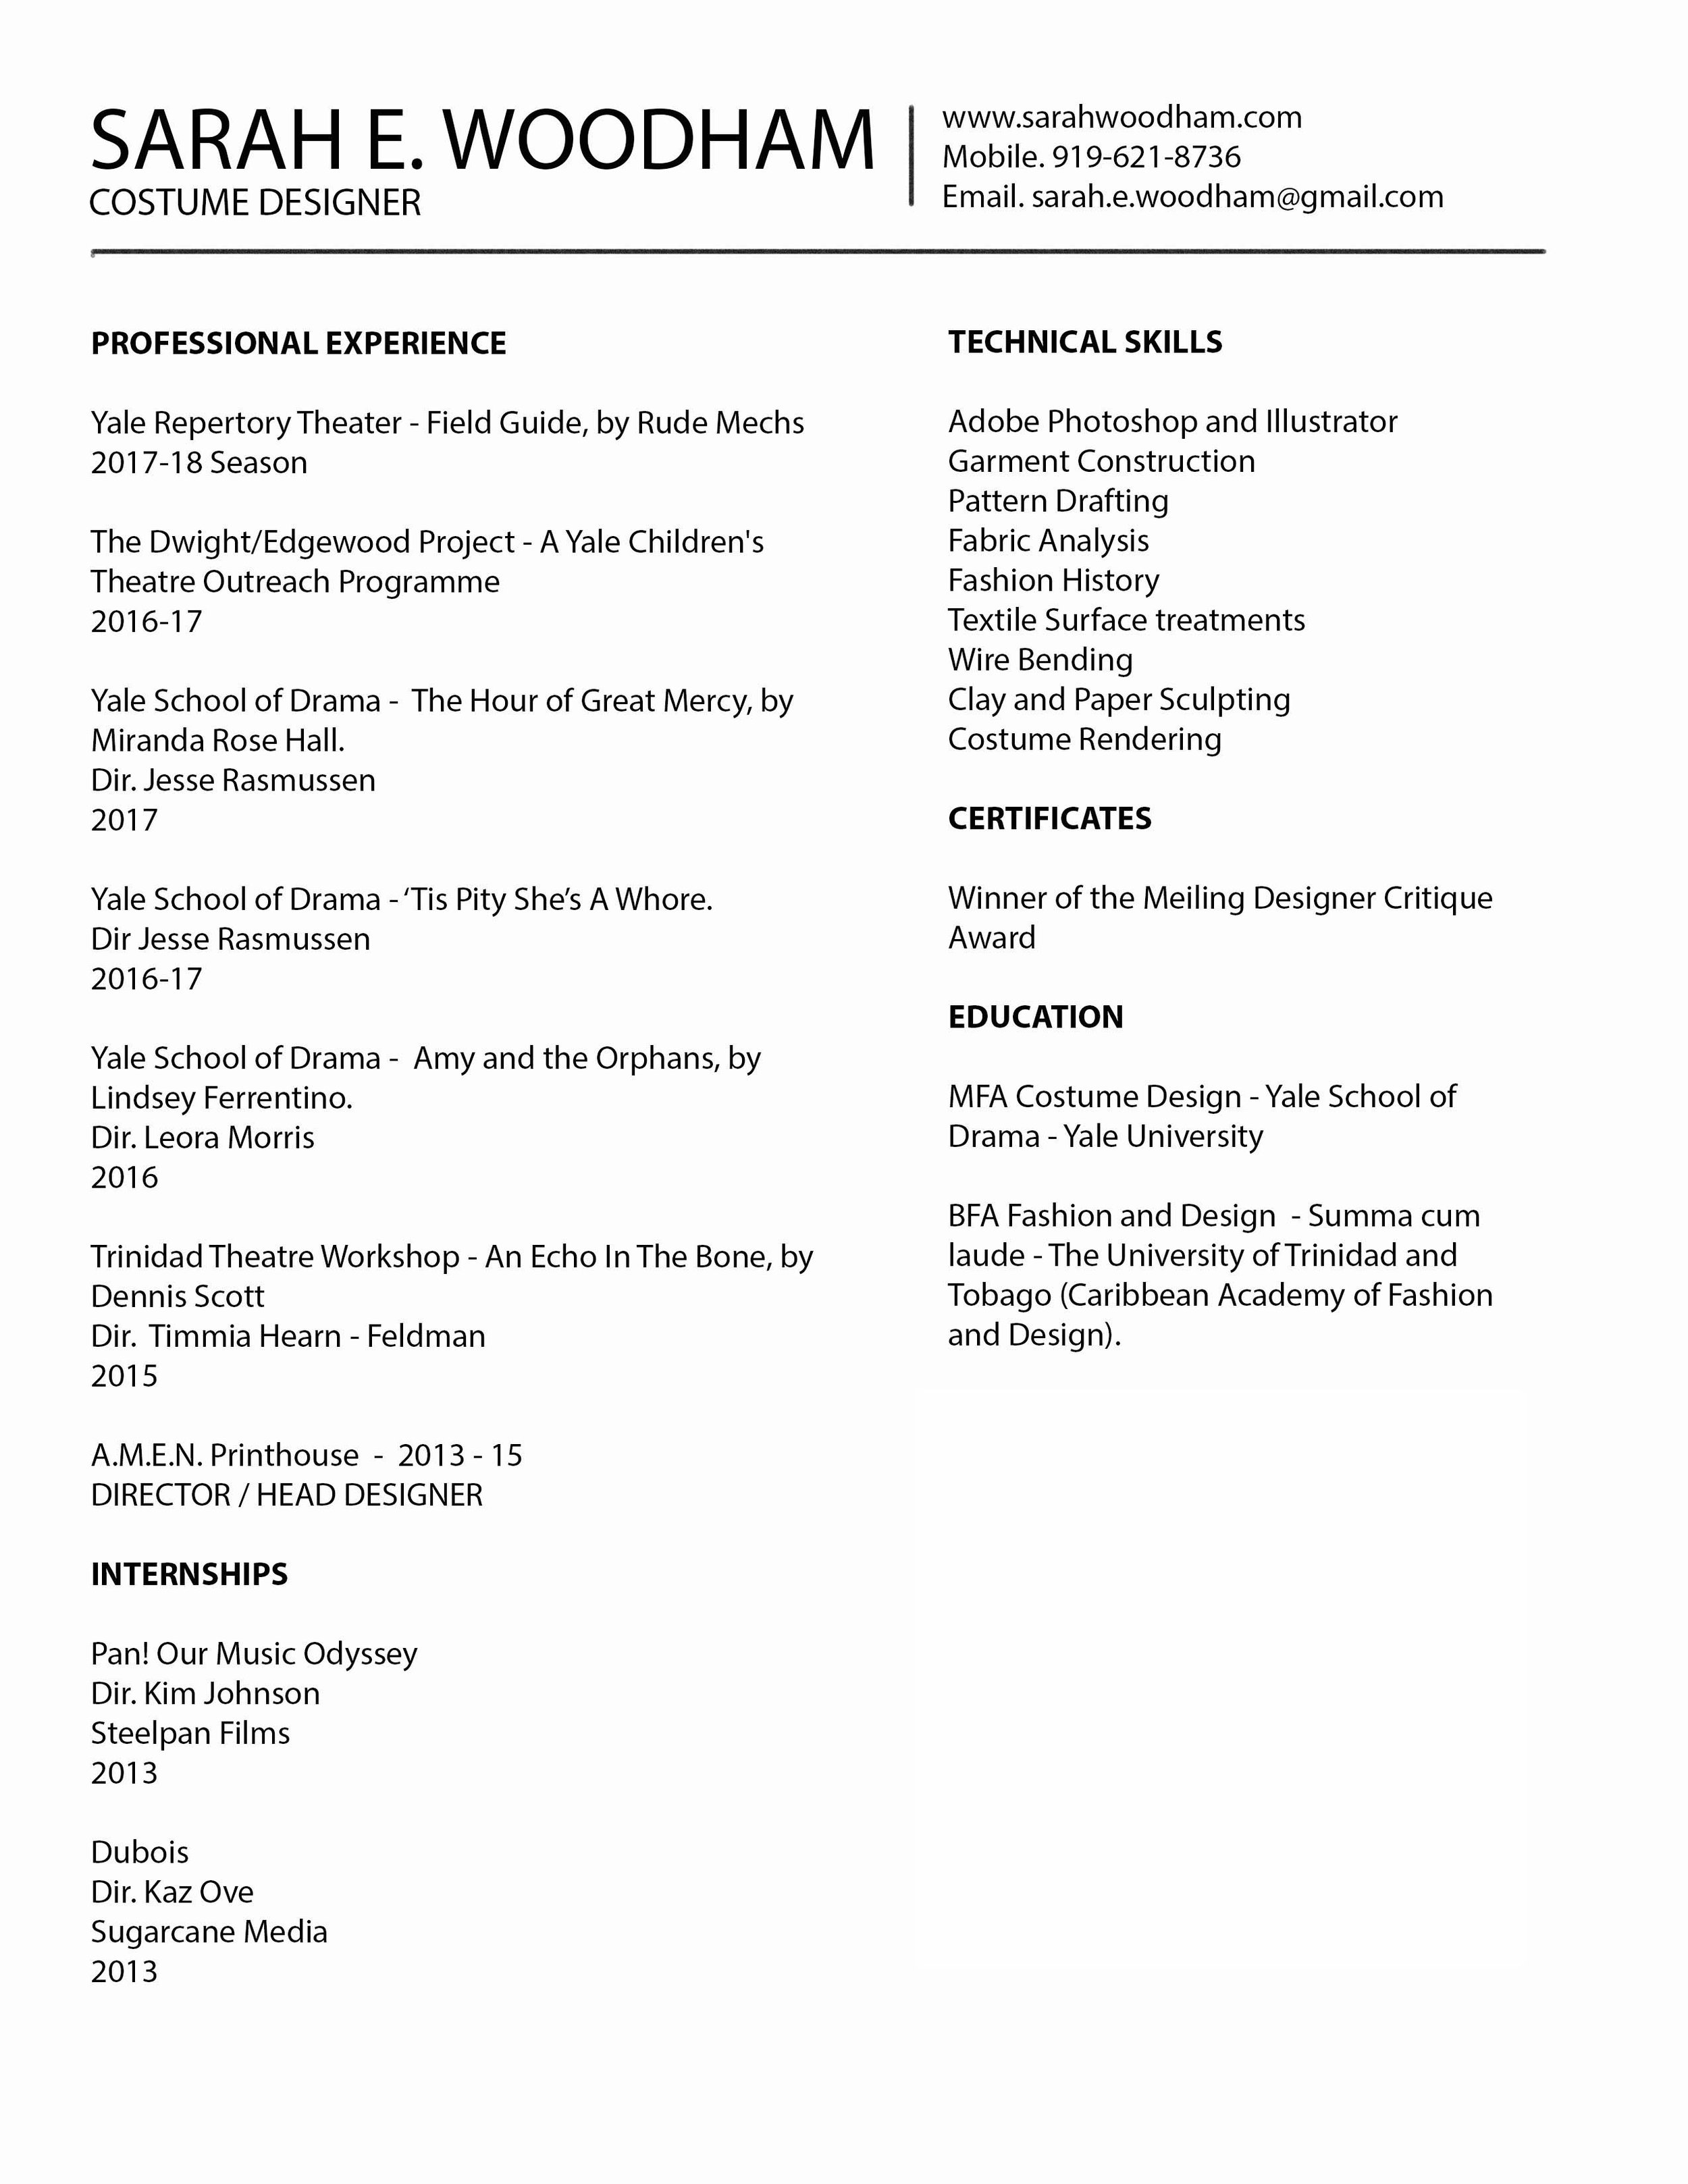 sarah woodham resume 2018 copy (no refs).jpeg